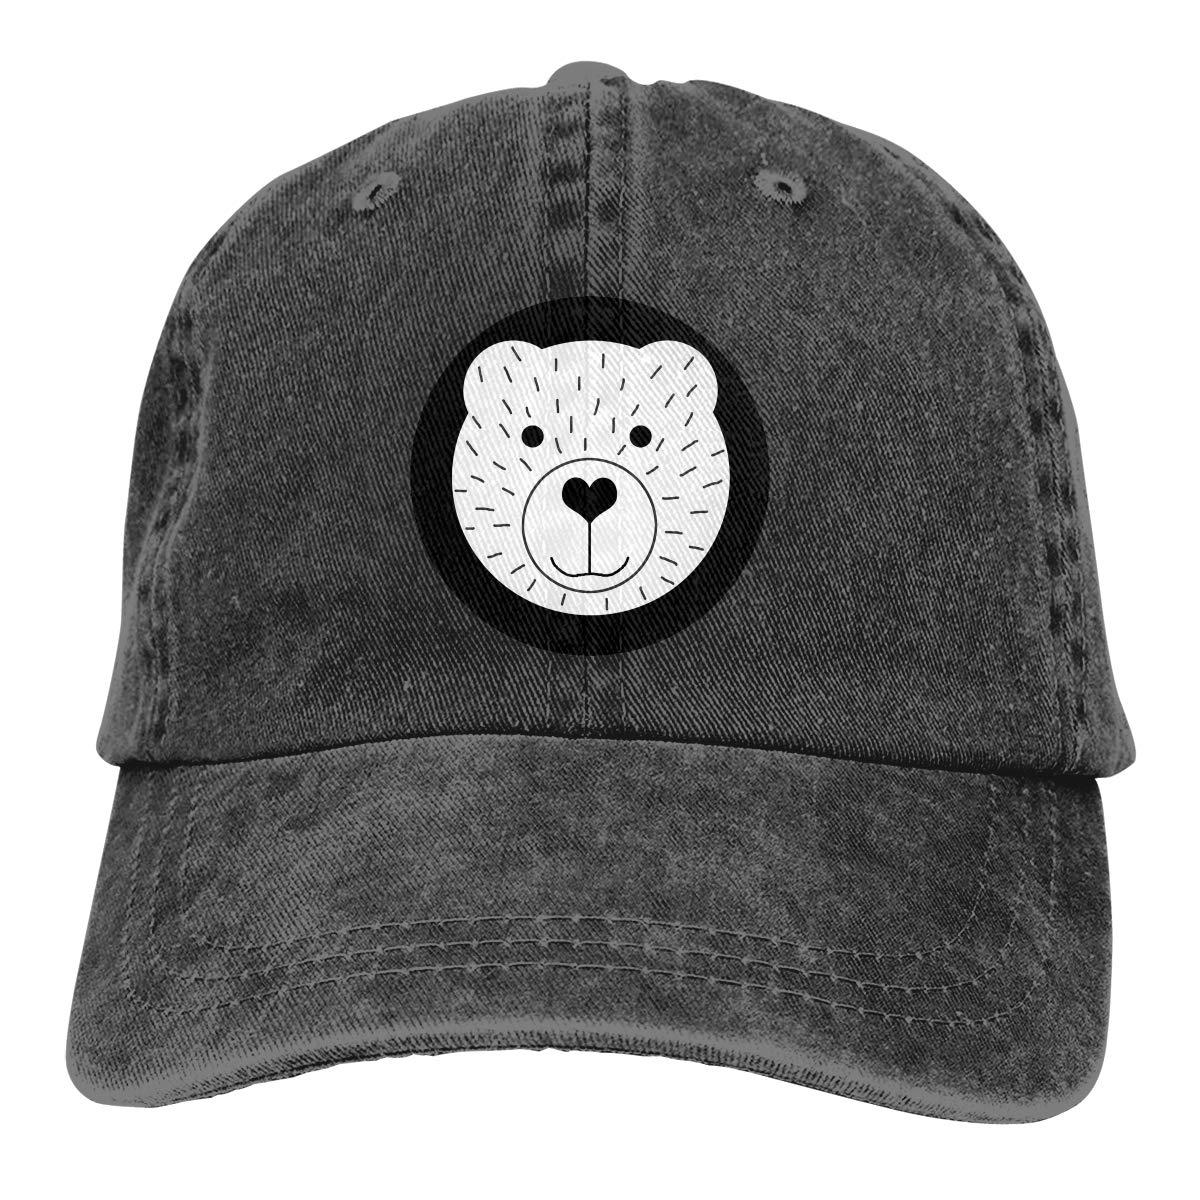 Qbeir Adult Unisex Cowboy Cap Adjustable Hat Bear Cartoon Cotton Denim